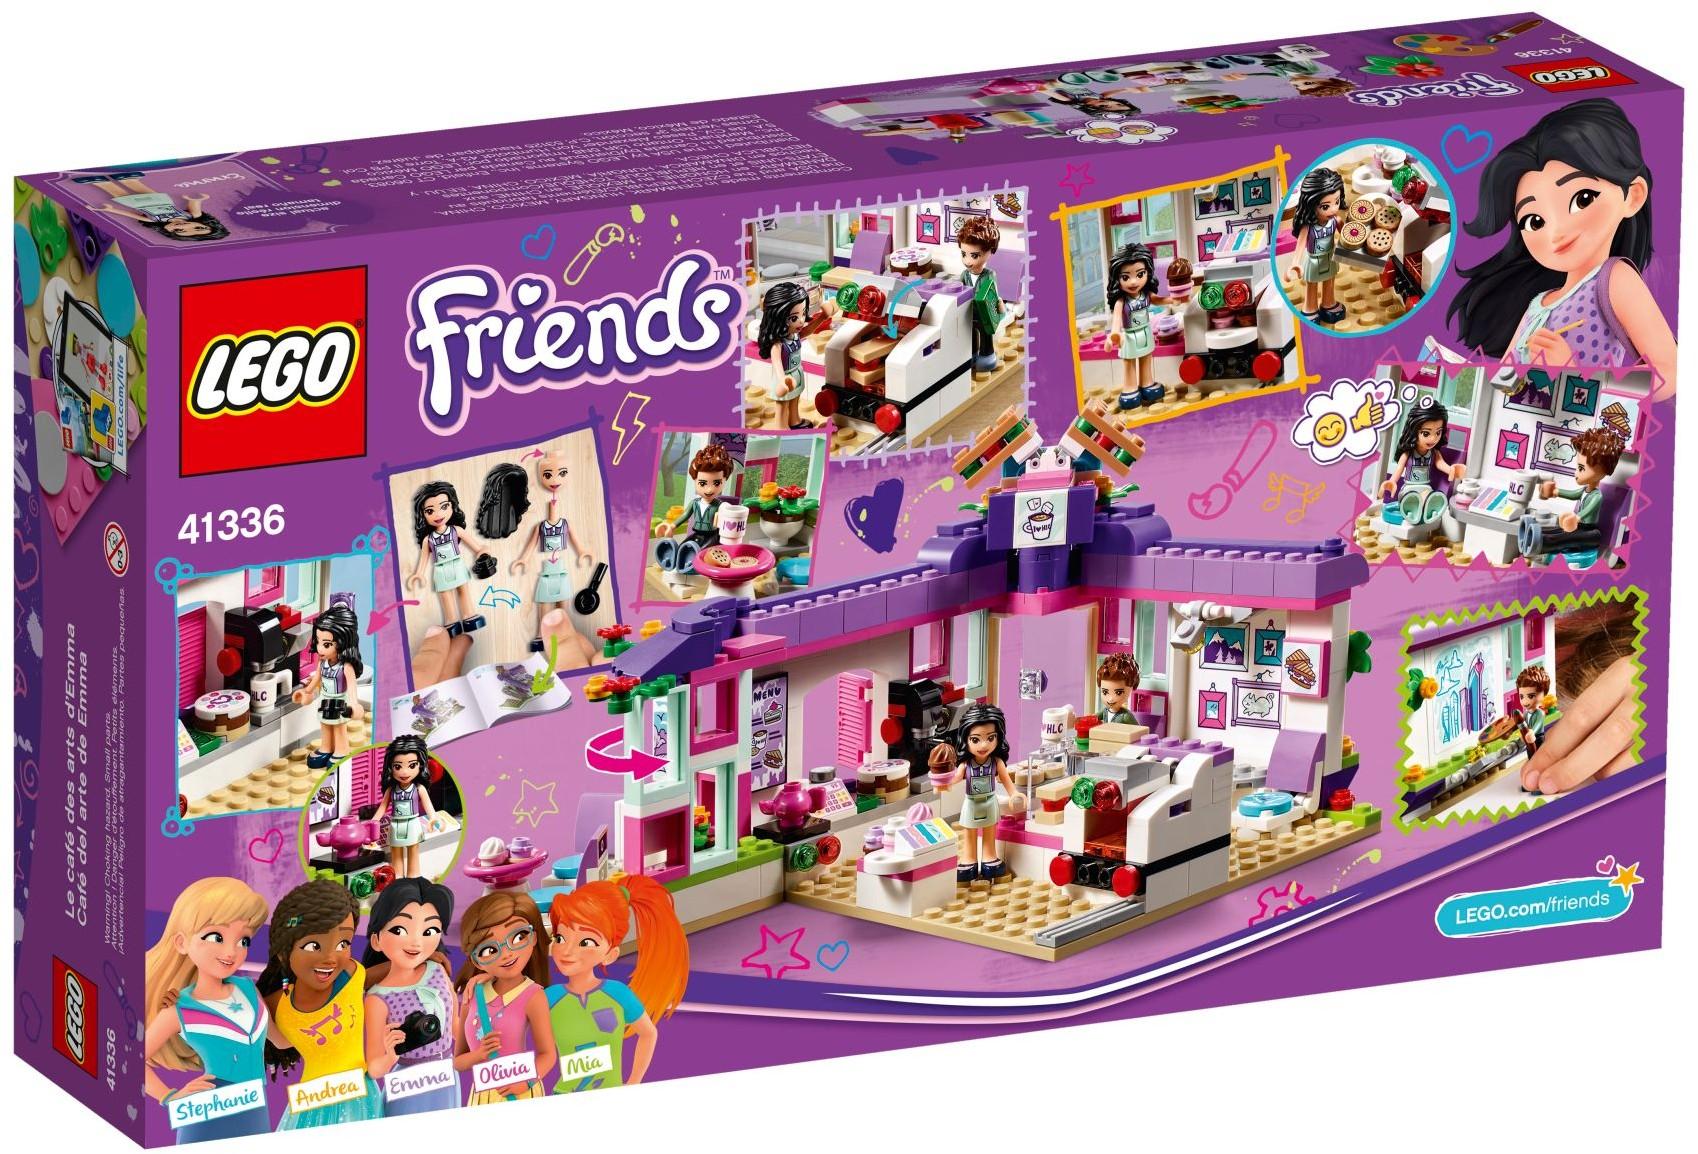 LEGO Friends Sets: 41336 Emma's Art Cafe NEW